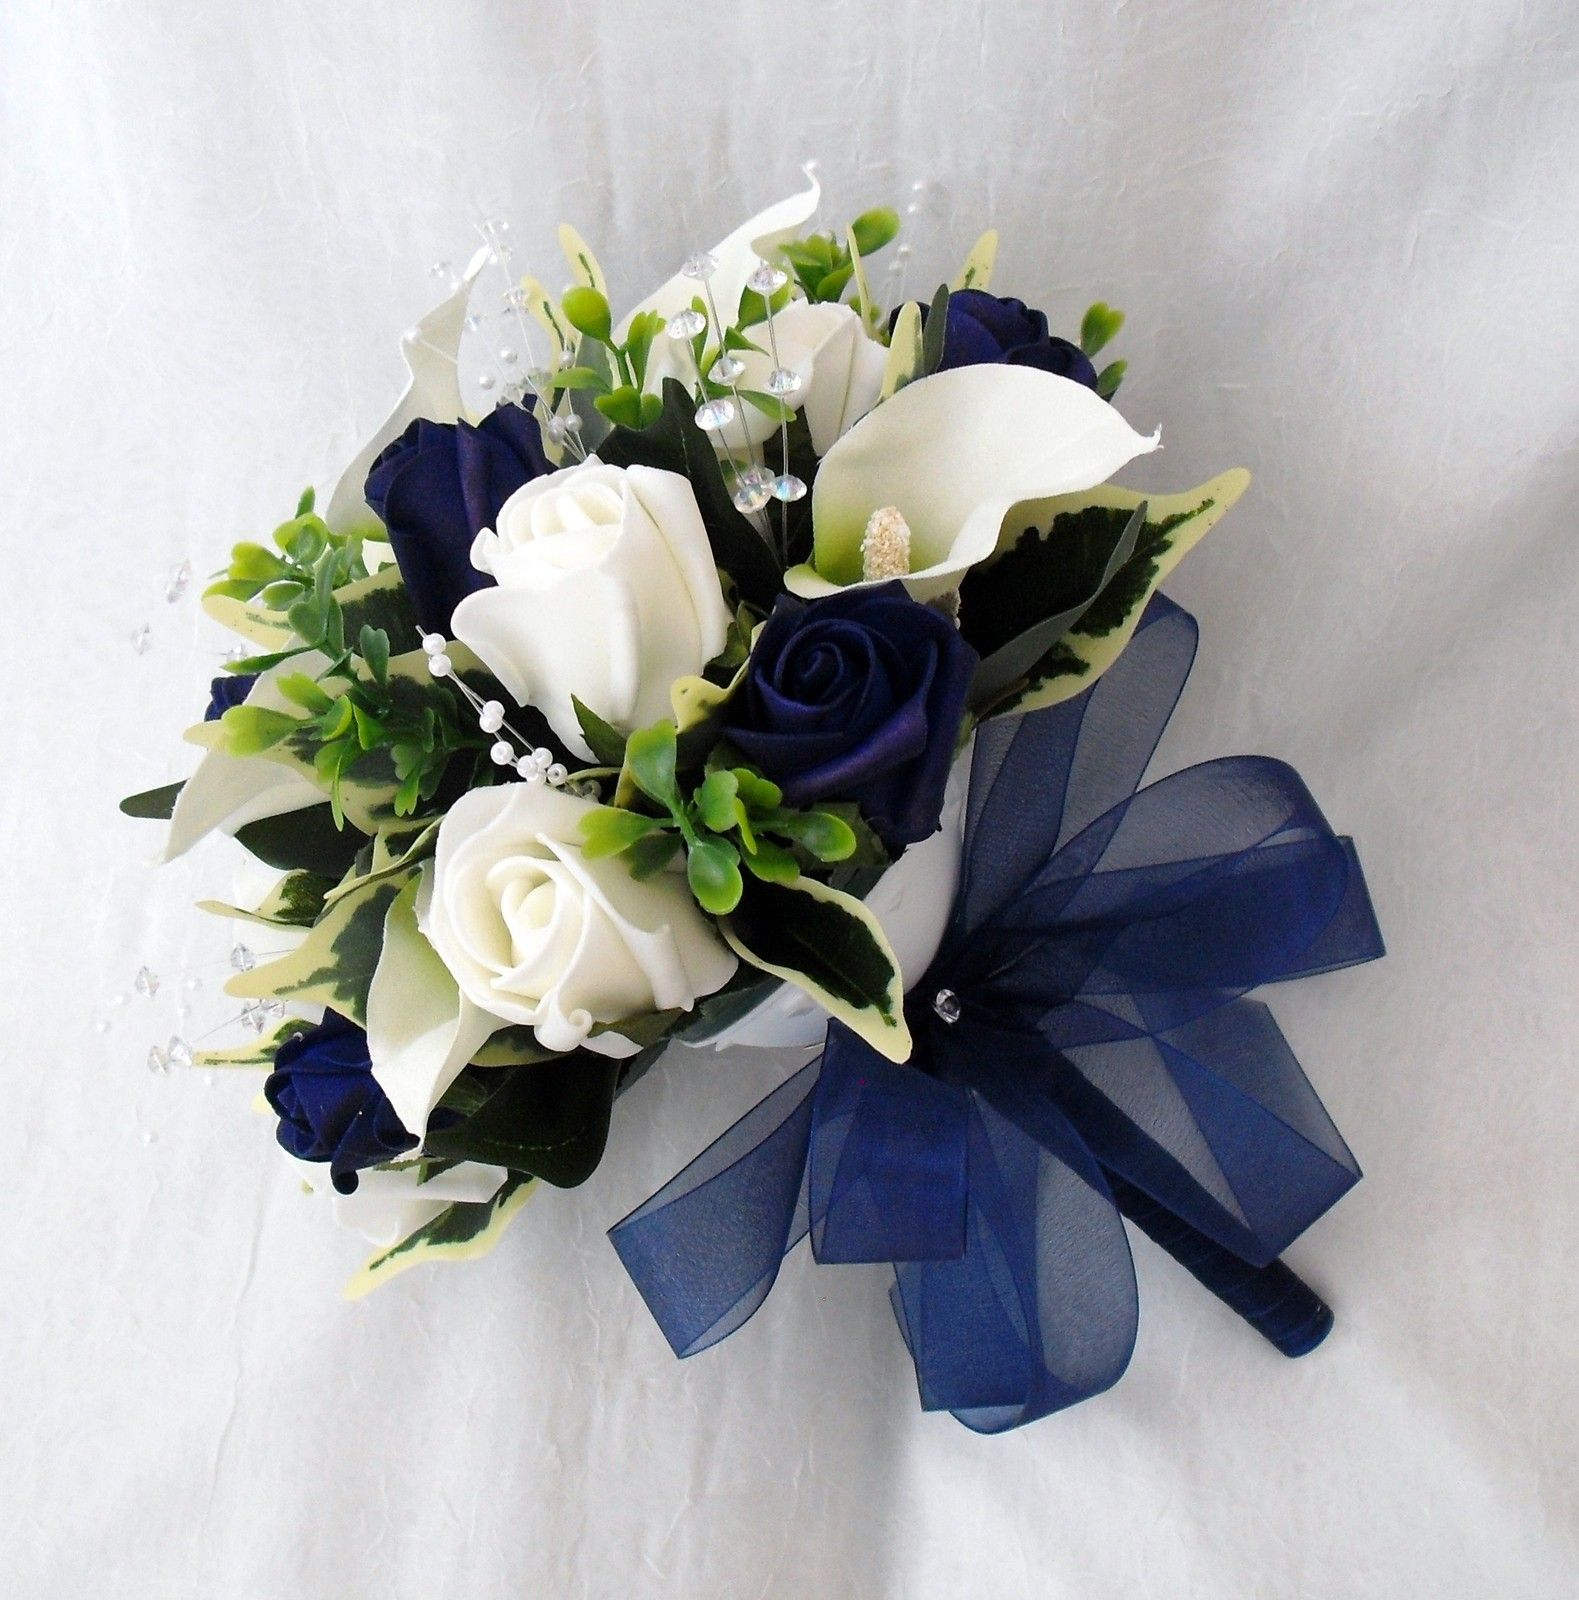 casamento-decoracao-bouque-flores-convencao-boho-eventos-producao-buque-noiva